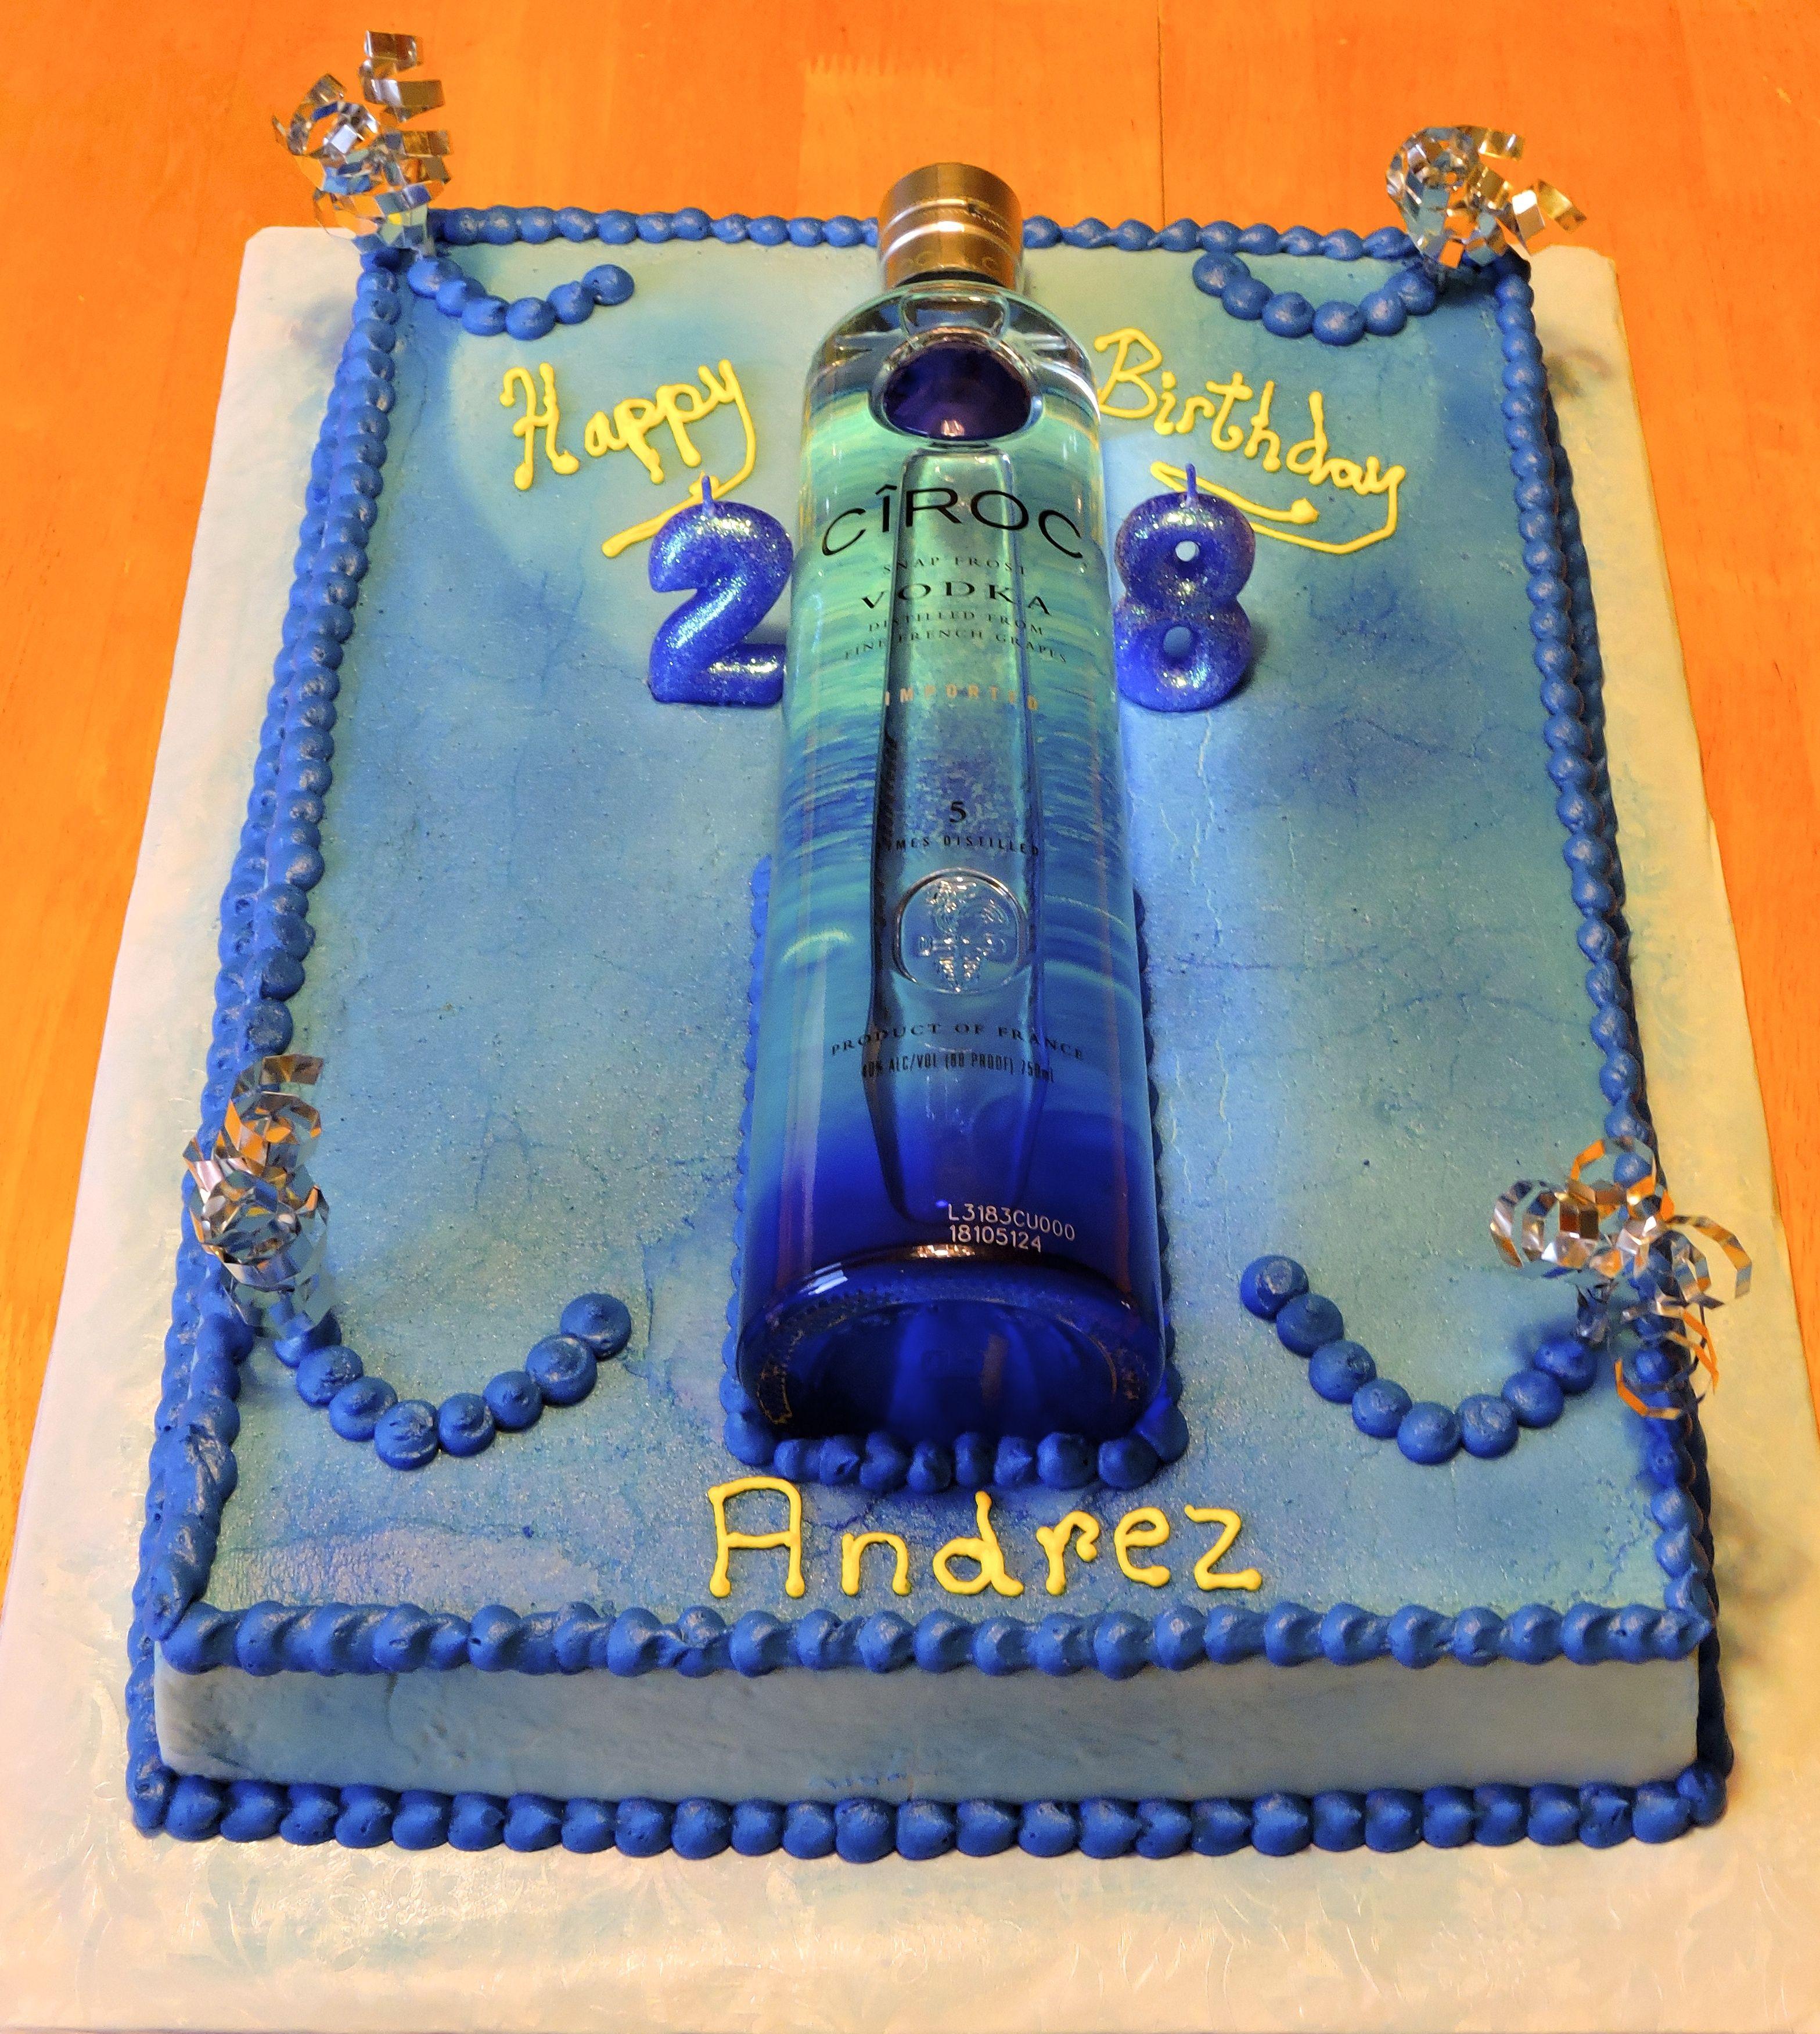 Ciroc Cake eb3 Pinterest Cake Birthday cakes and Frosting